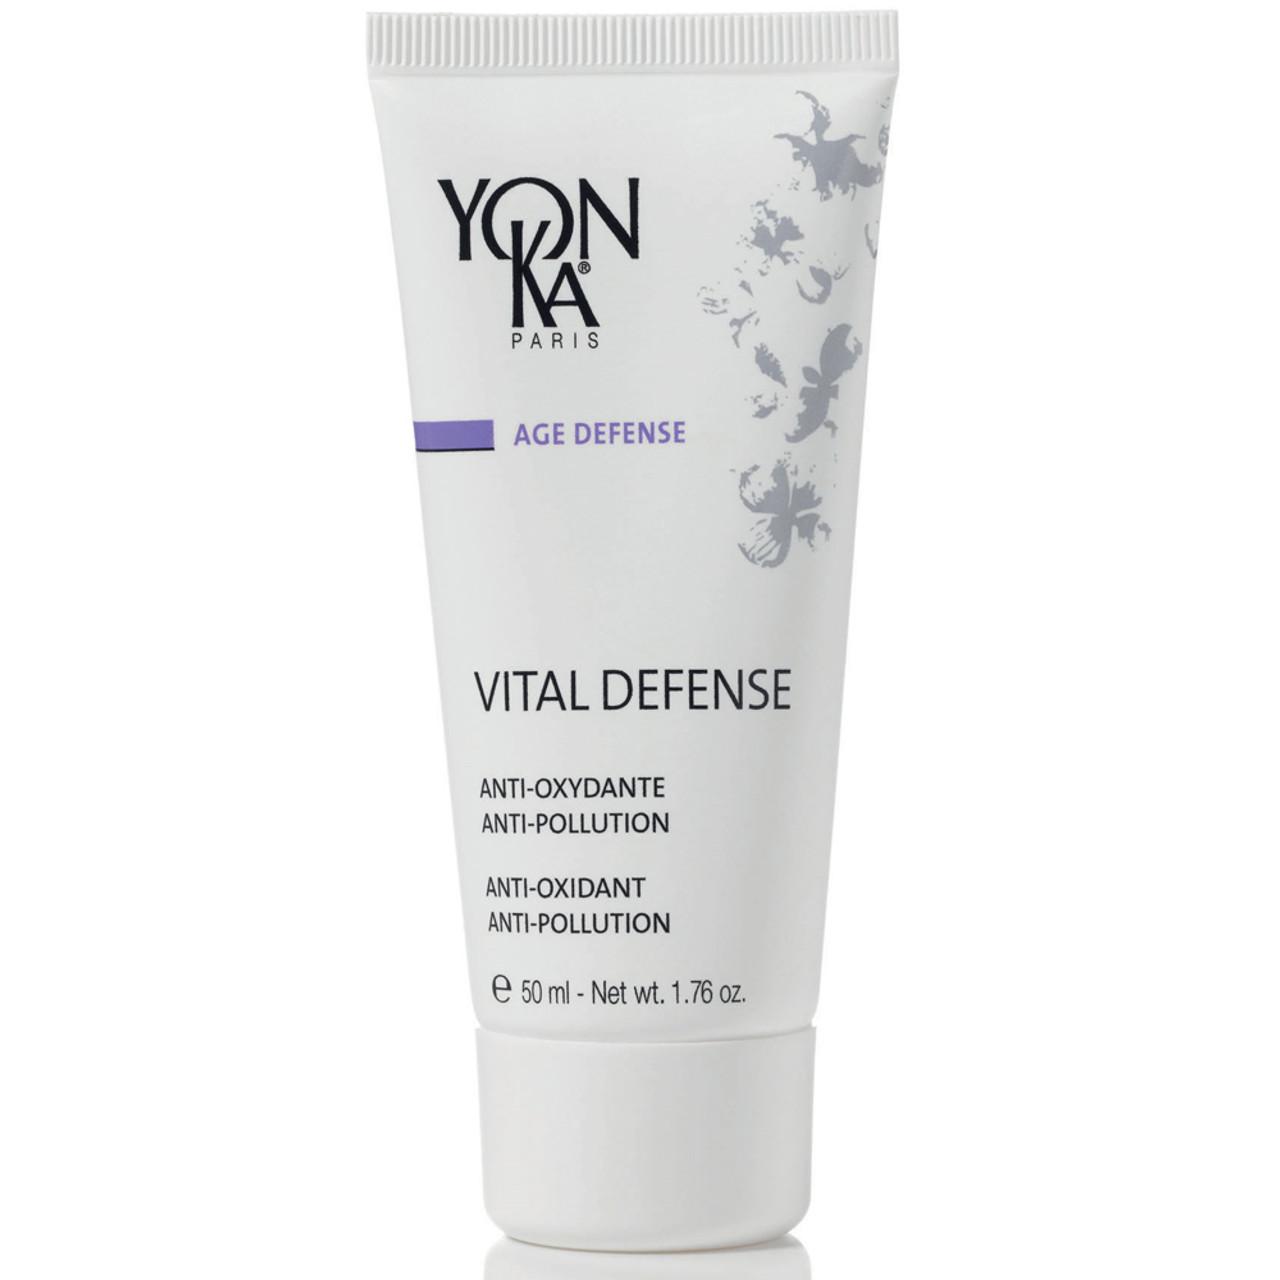 YonKa Vital Defense BeautifiedYou.com